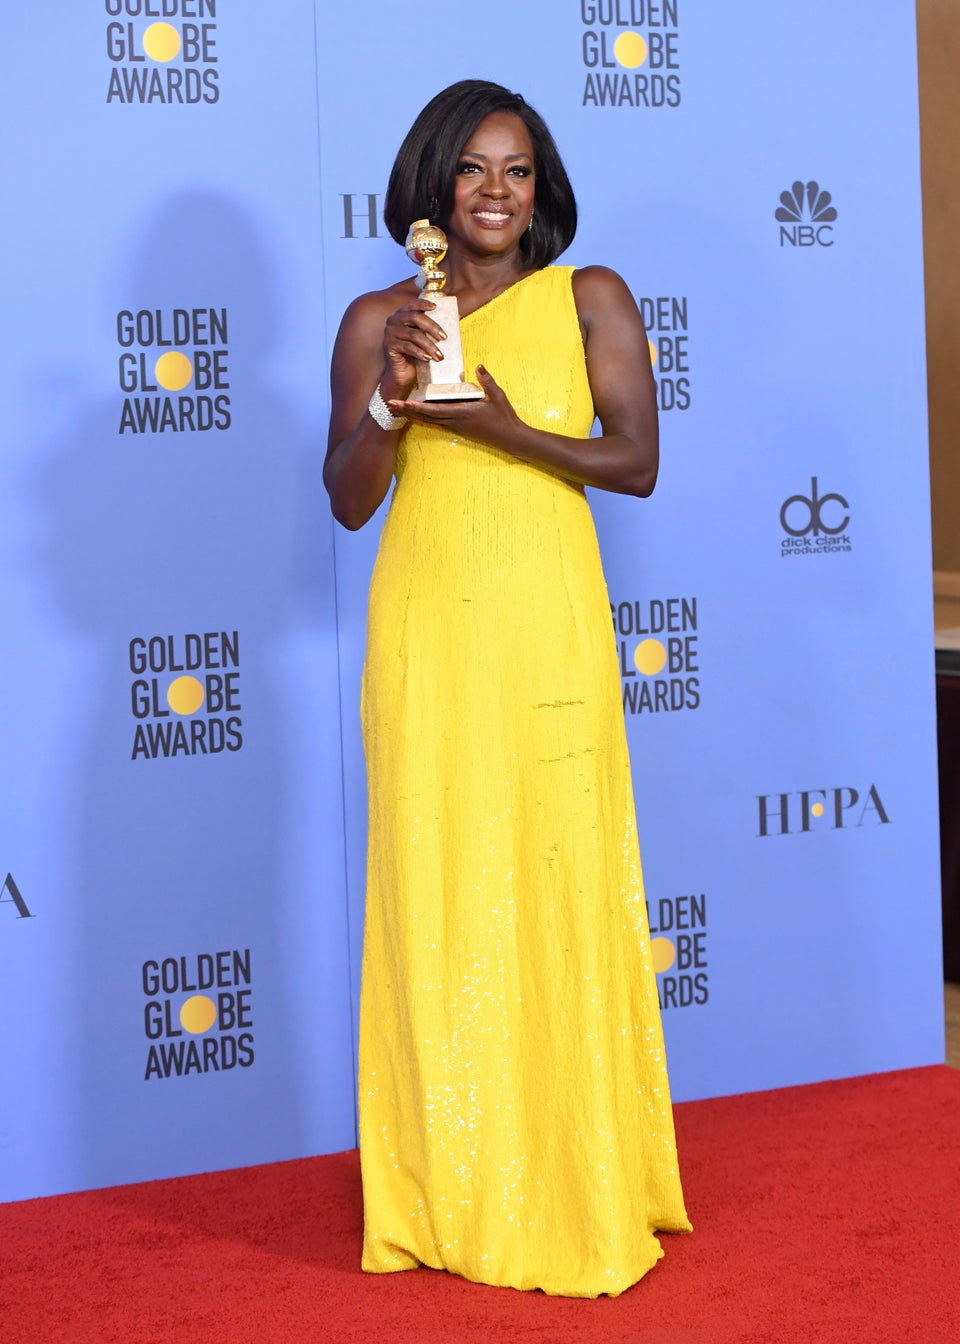 Viola Davis Talks President-Elect Donald Trump Post Golden Globe Win